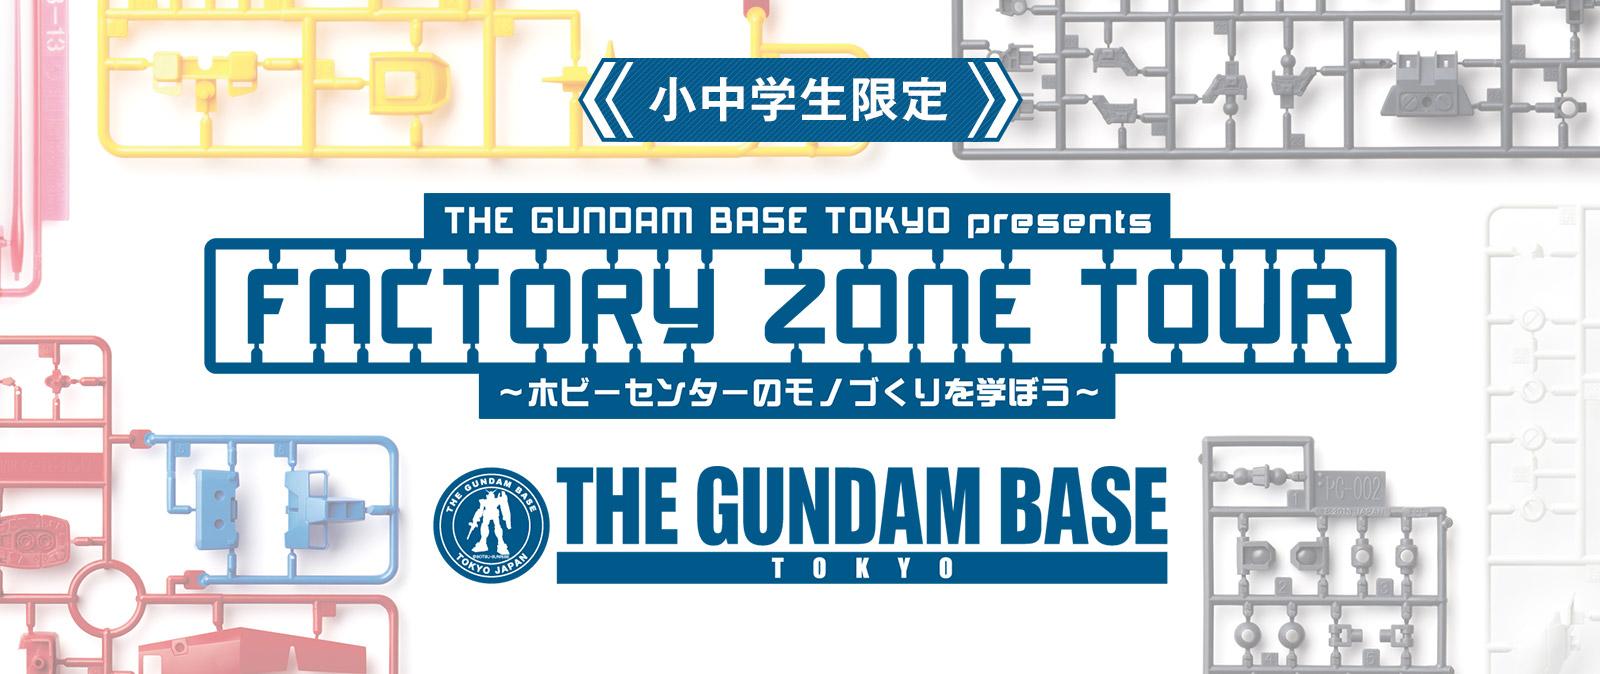 FACTORY ZONE TOUR 12月14日(土)開催!